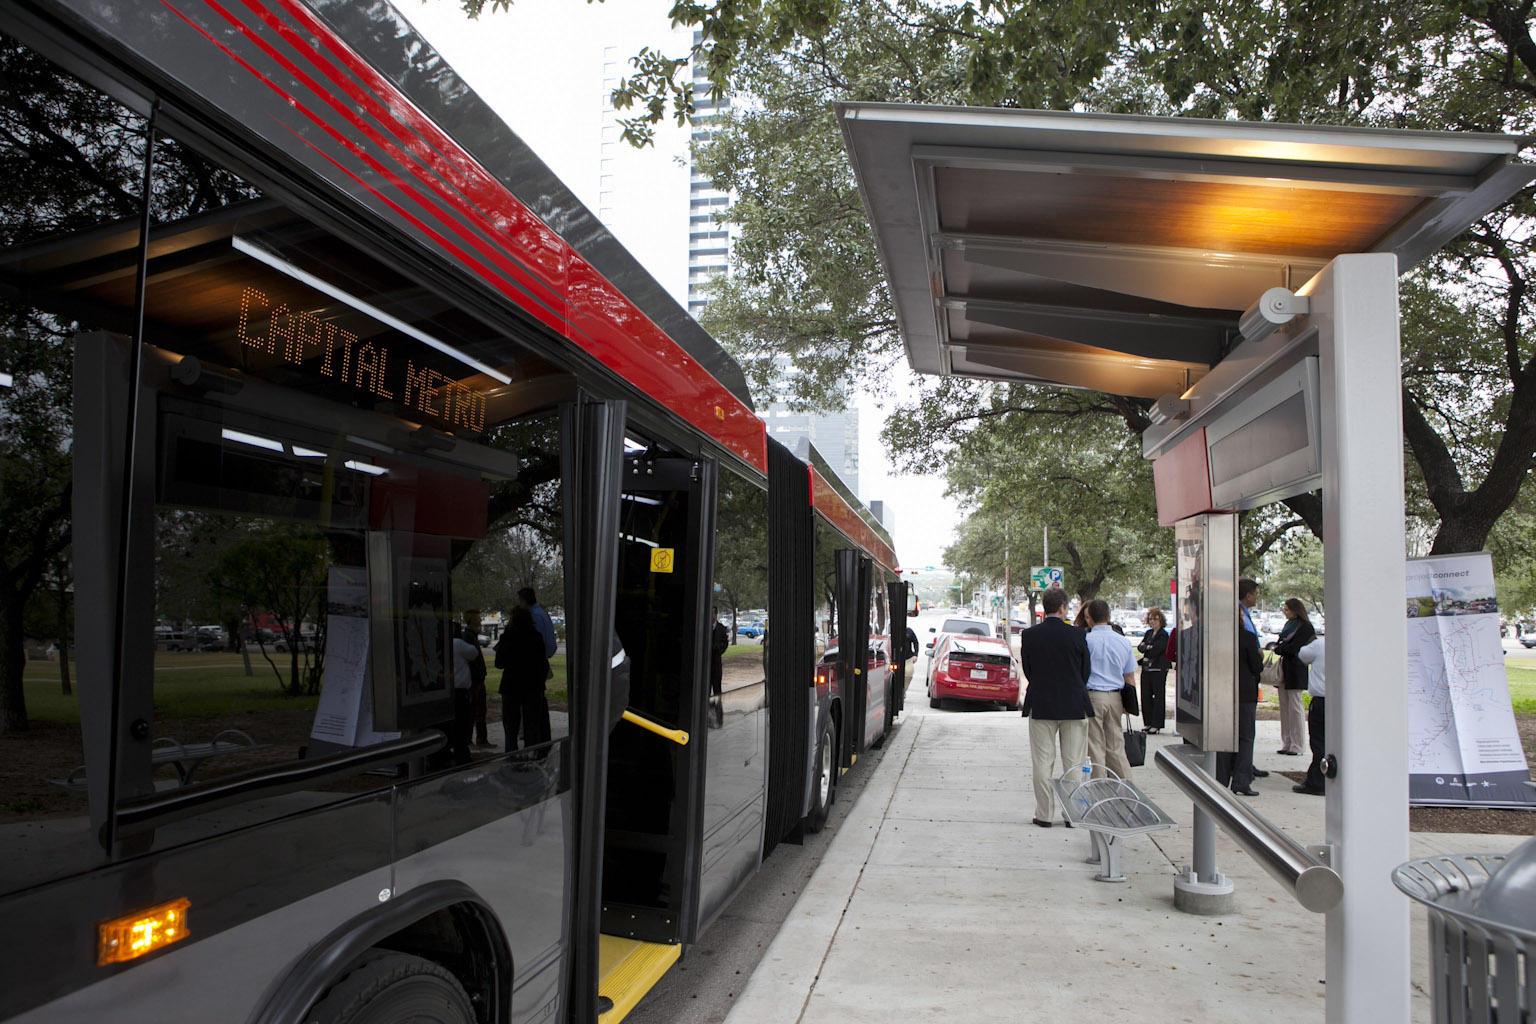 capital metro unveils proposed redesign of public transit system | kut